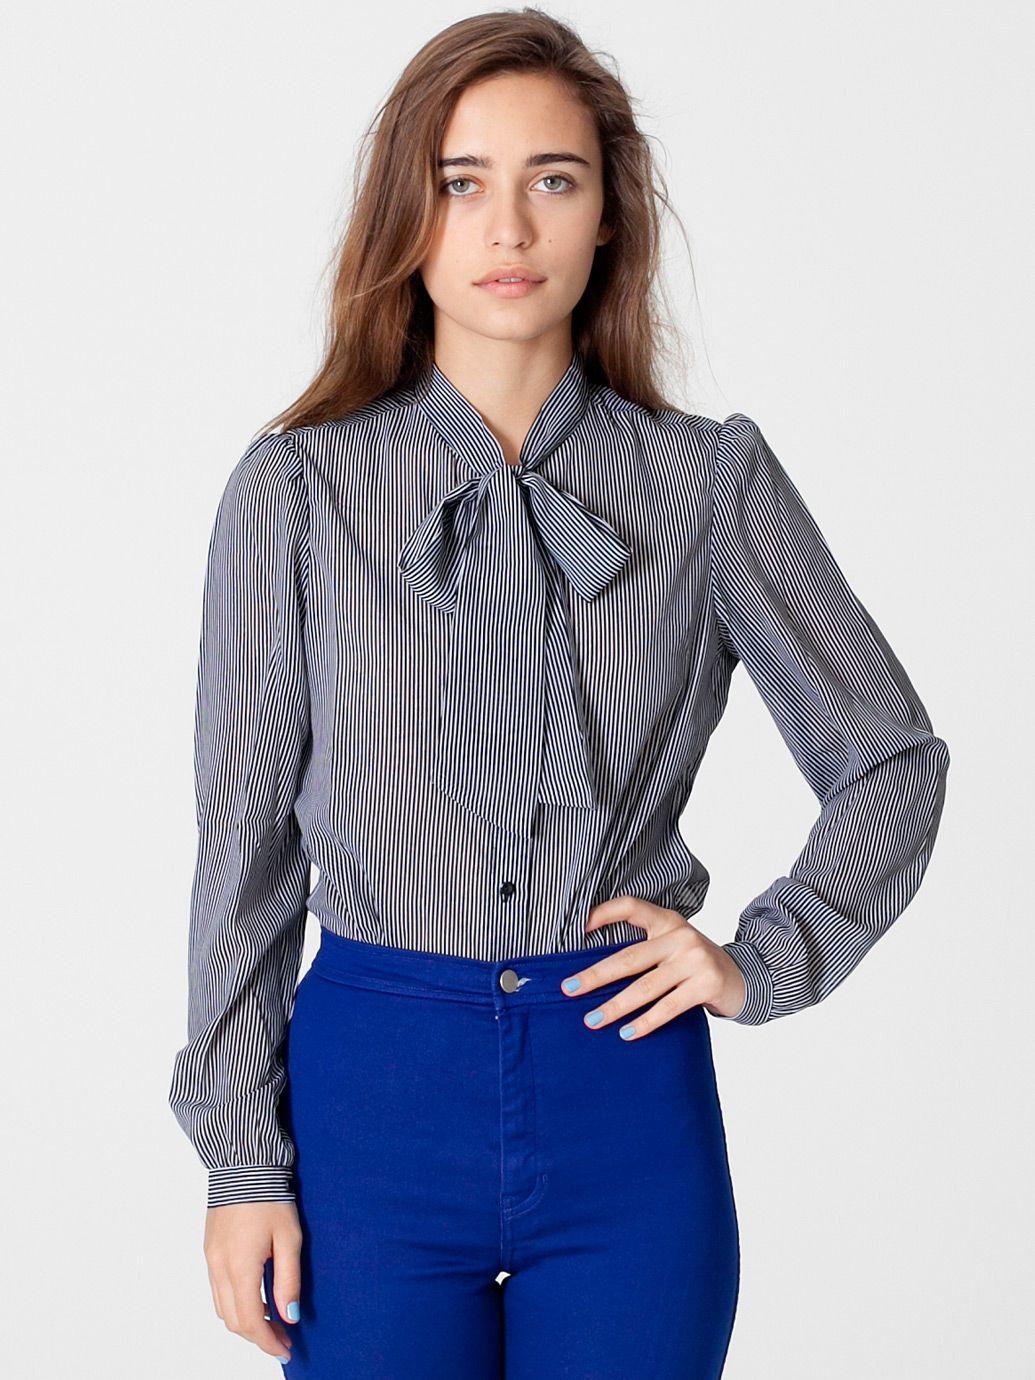 Stripe Chiffon Secretary Blouse Long Sleeves Womens Collared